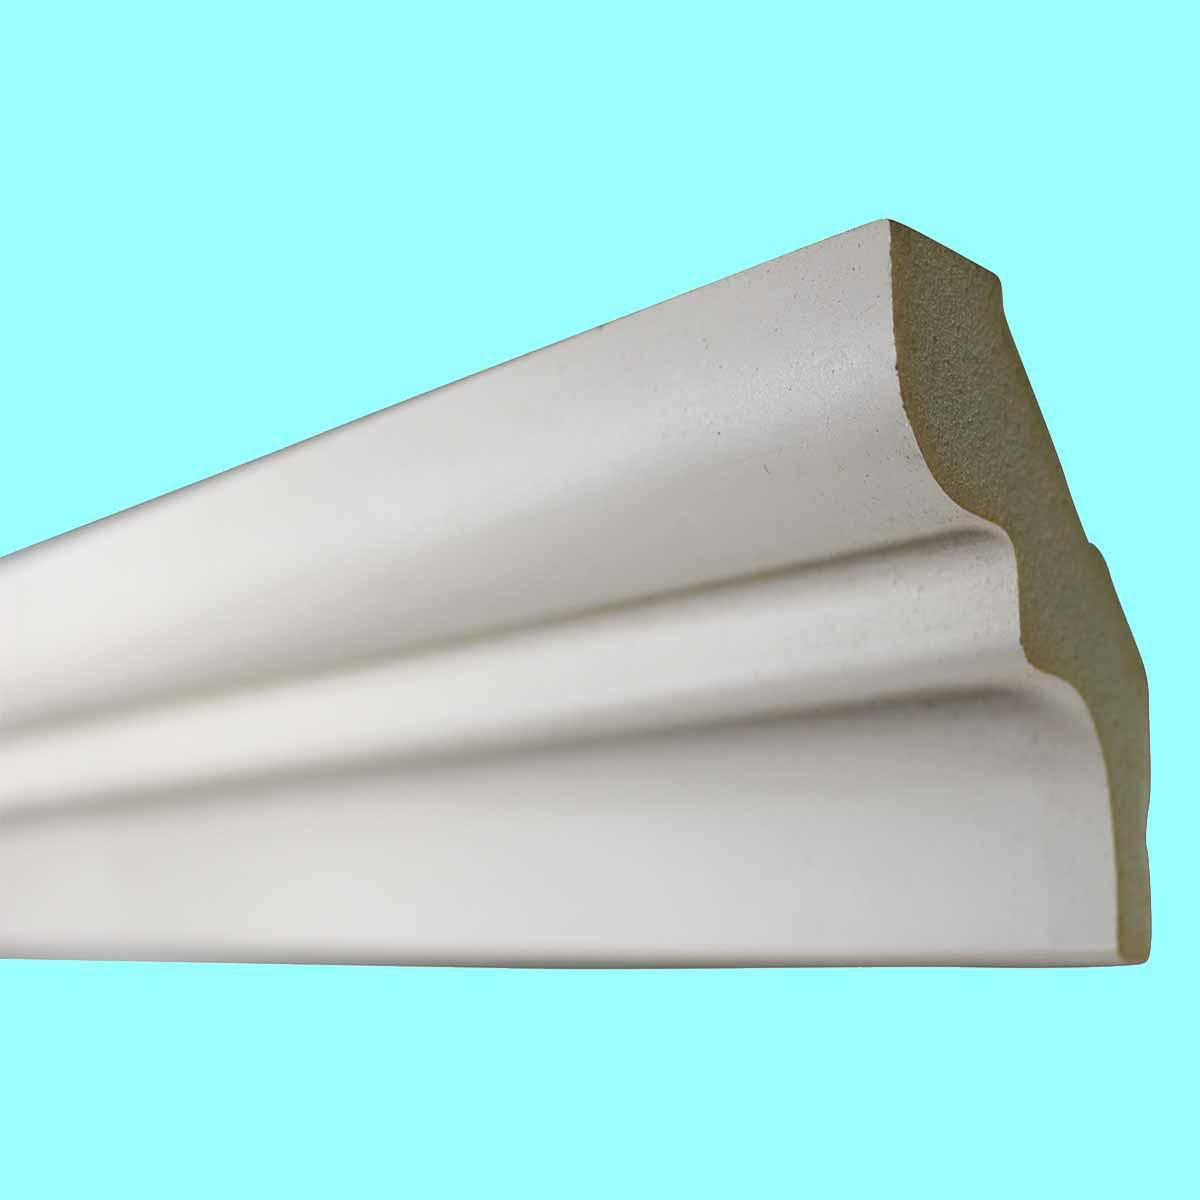 Cornice White Urethane Sample of 11466 24 Long Cornice Cornice Moulding Cornice Molding